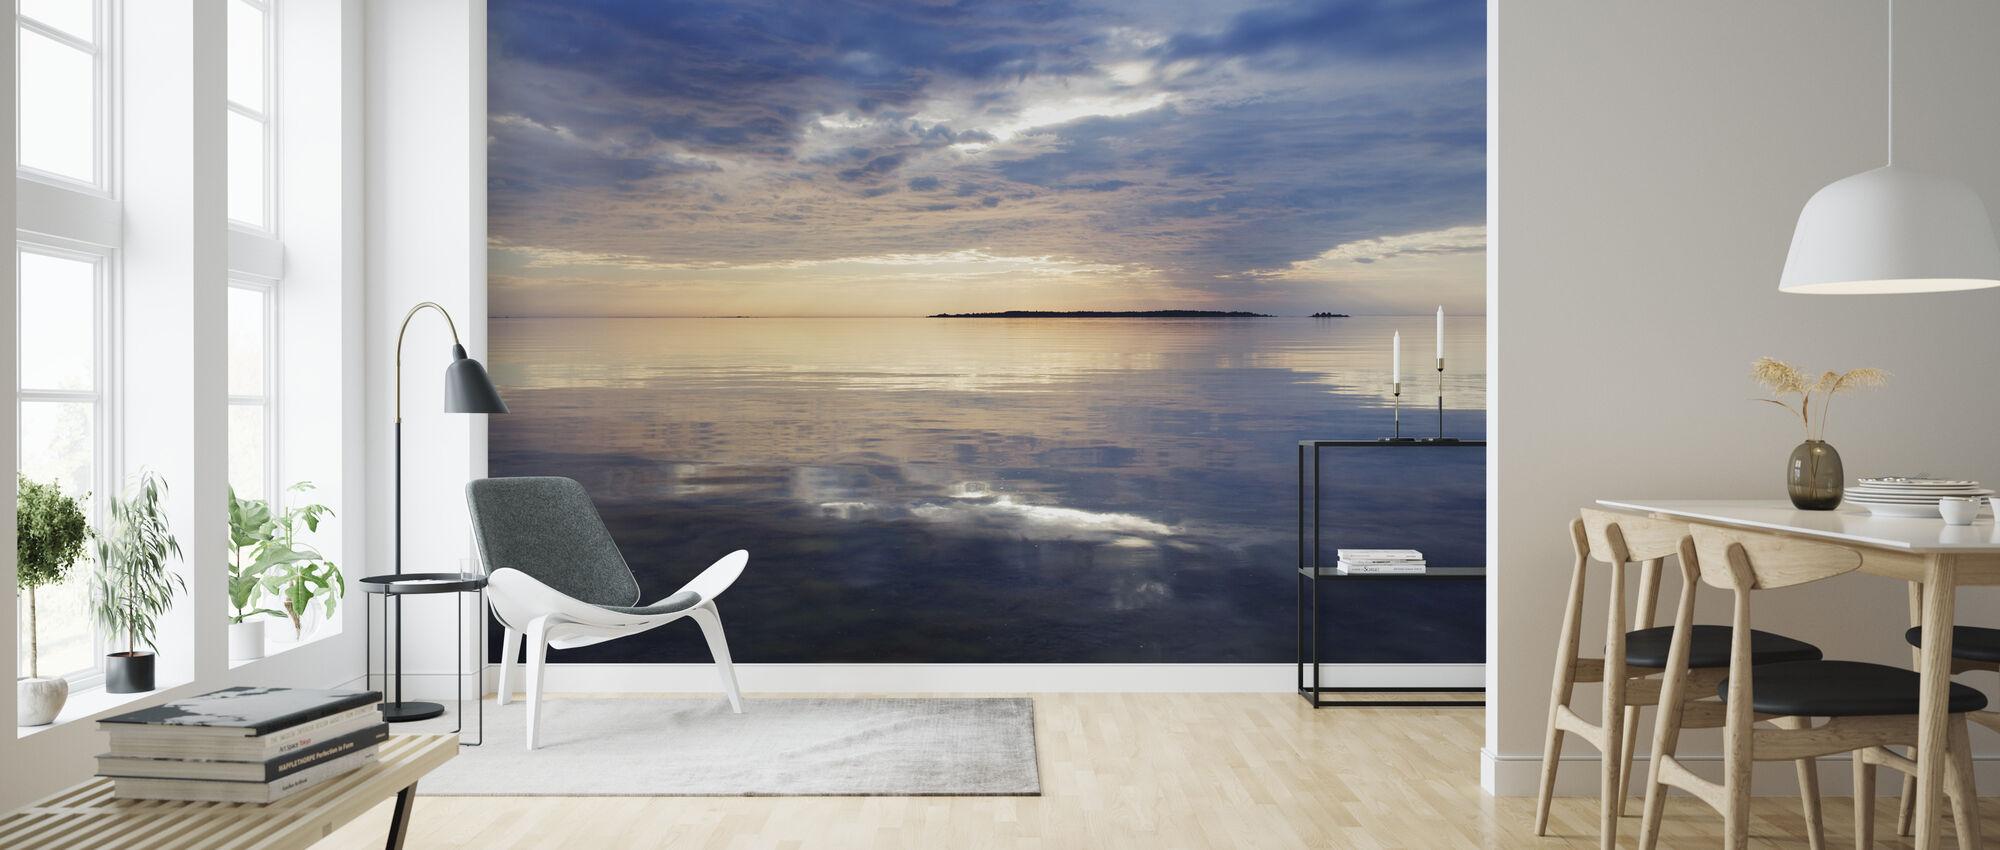 Sky Mirrored in Baltic Sea - Wallpaper - Living Room